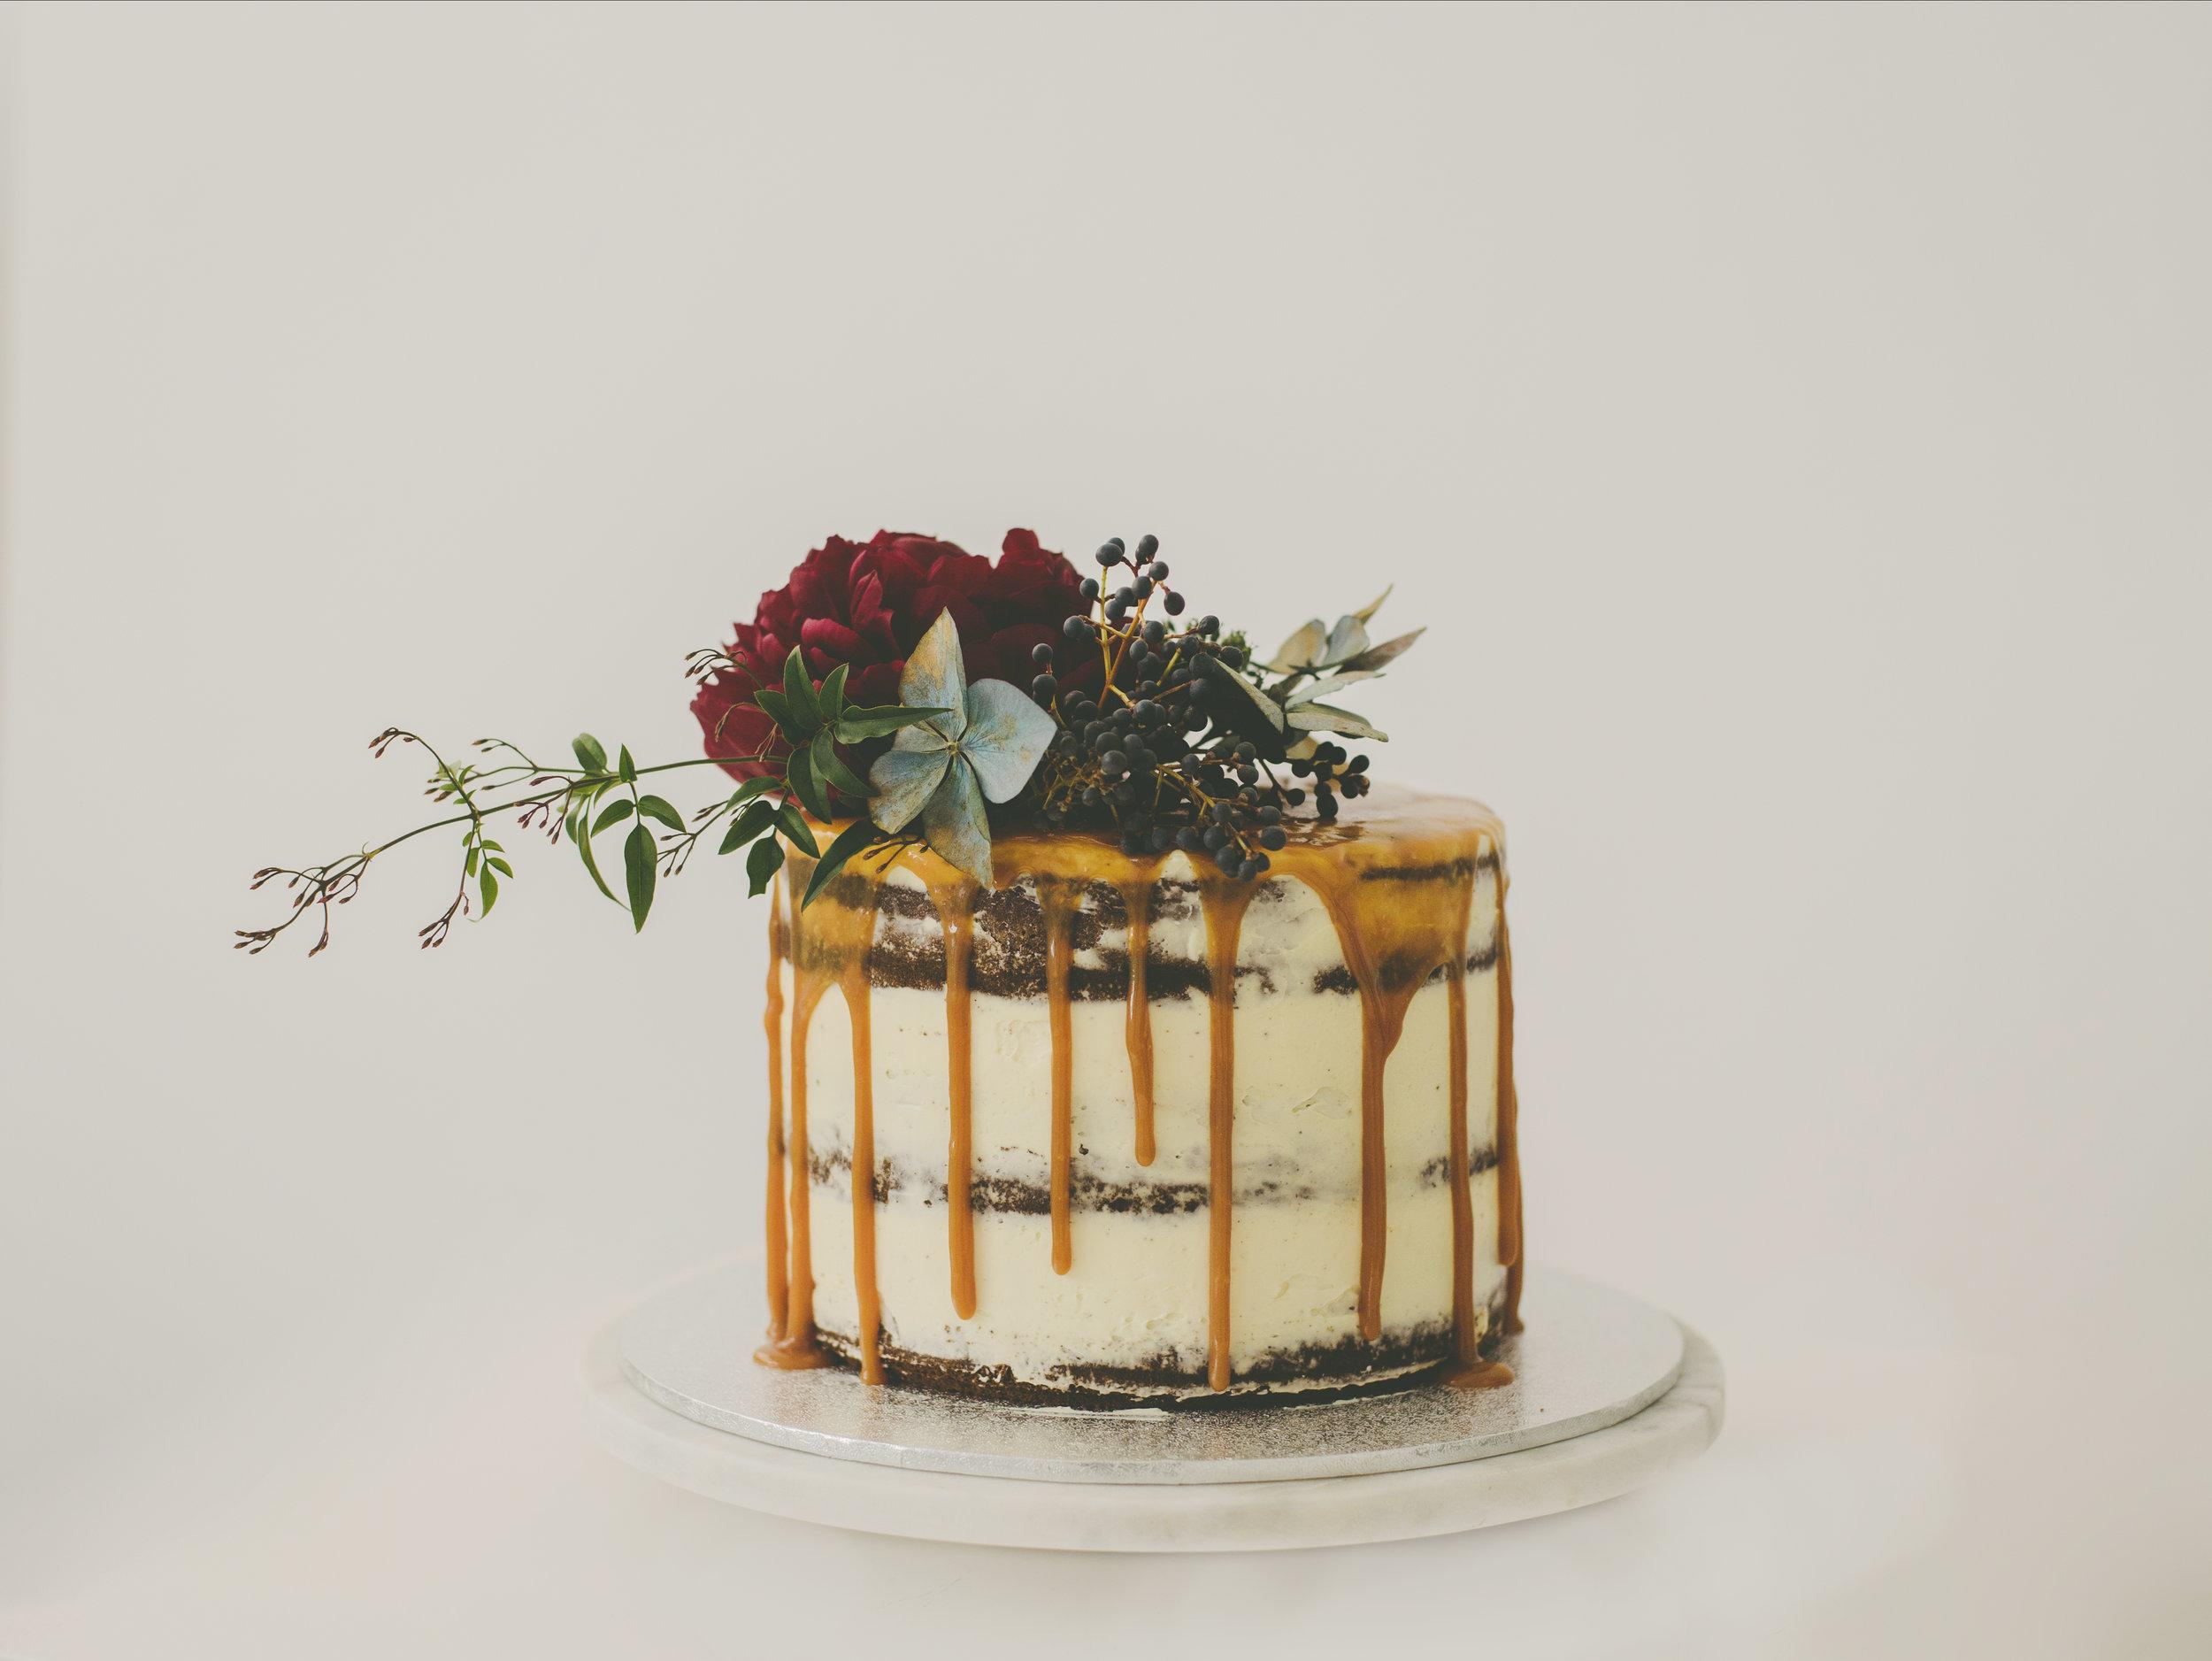 Dark Chocolate Caramel Drip Cake